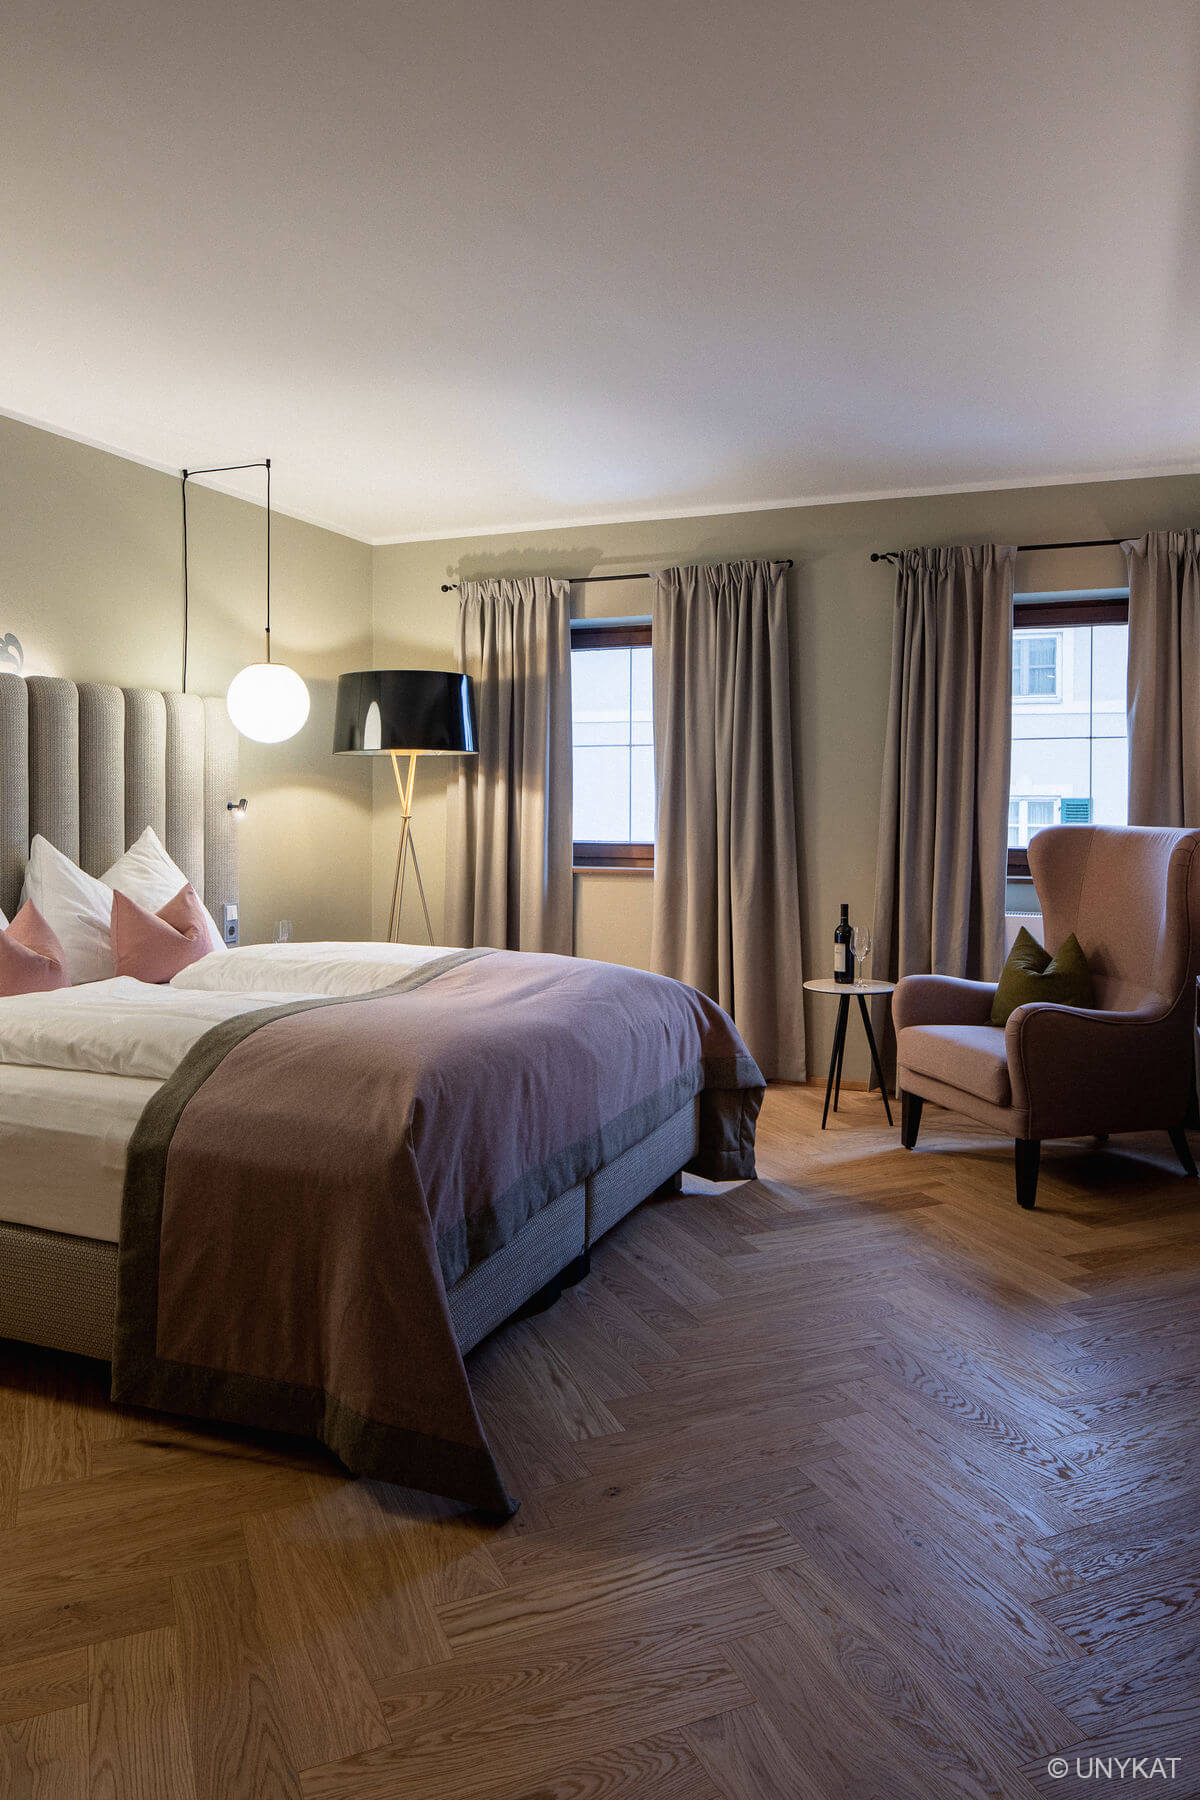 hotelausstattung-hoteleinrichtungen-bachhuber-Hotel-Gmachl5